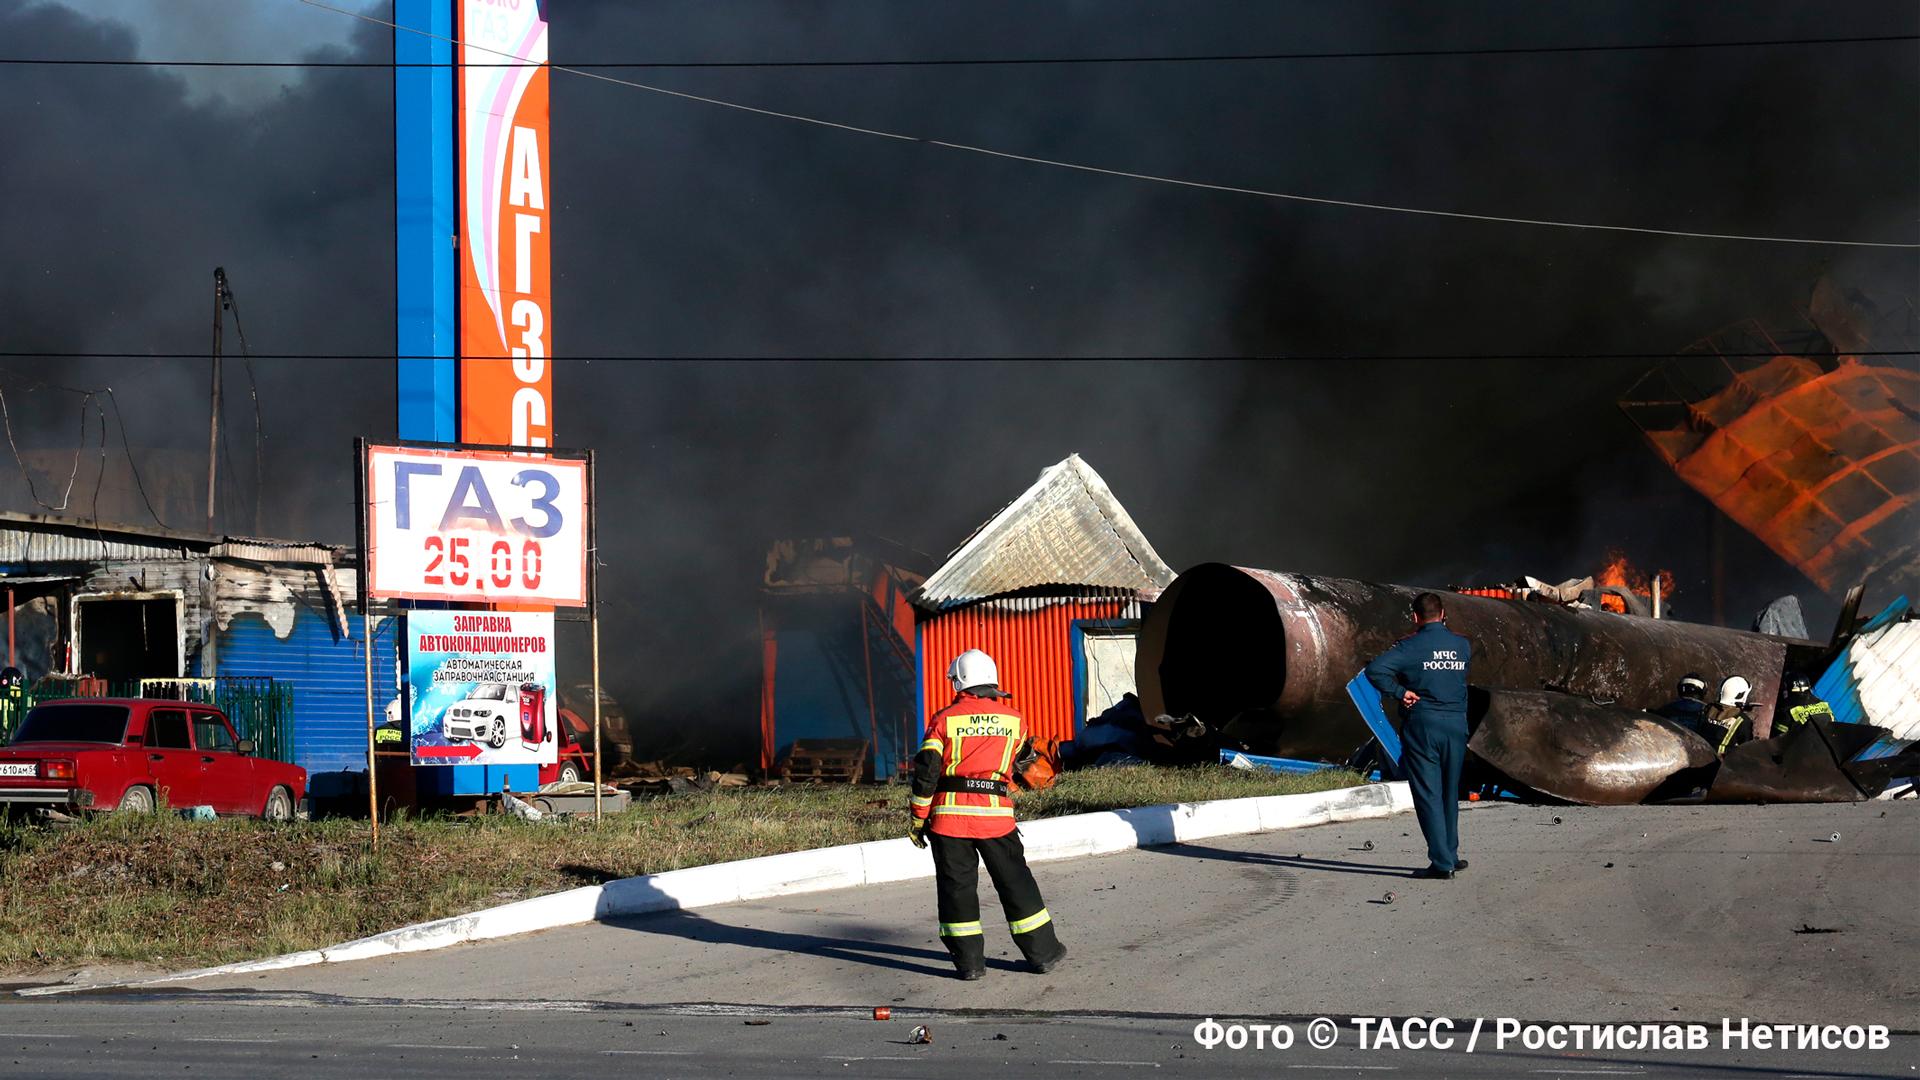 <p>Фото © ТАСС / Ростислав Нетисов</p>